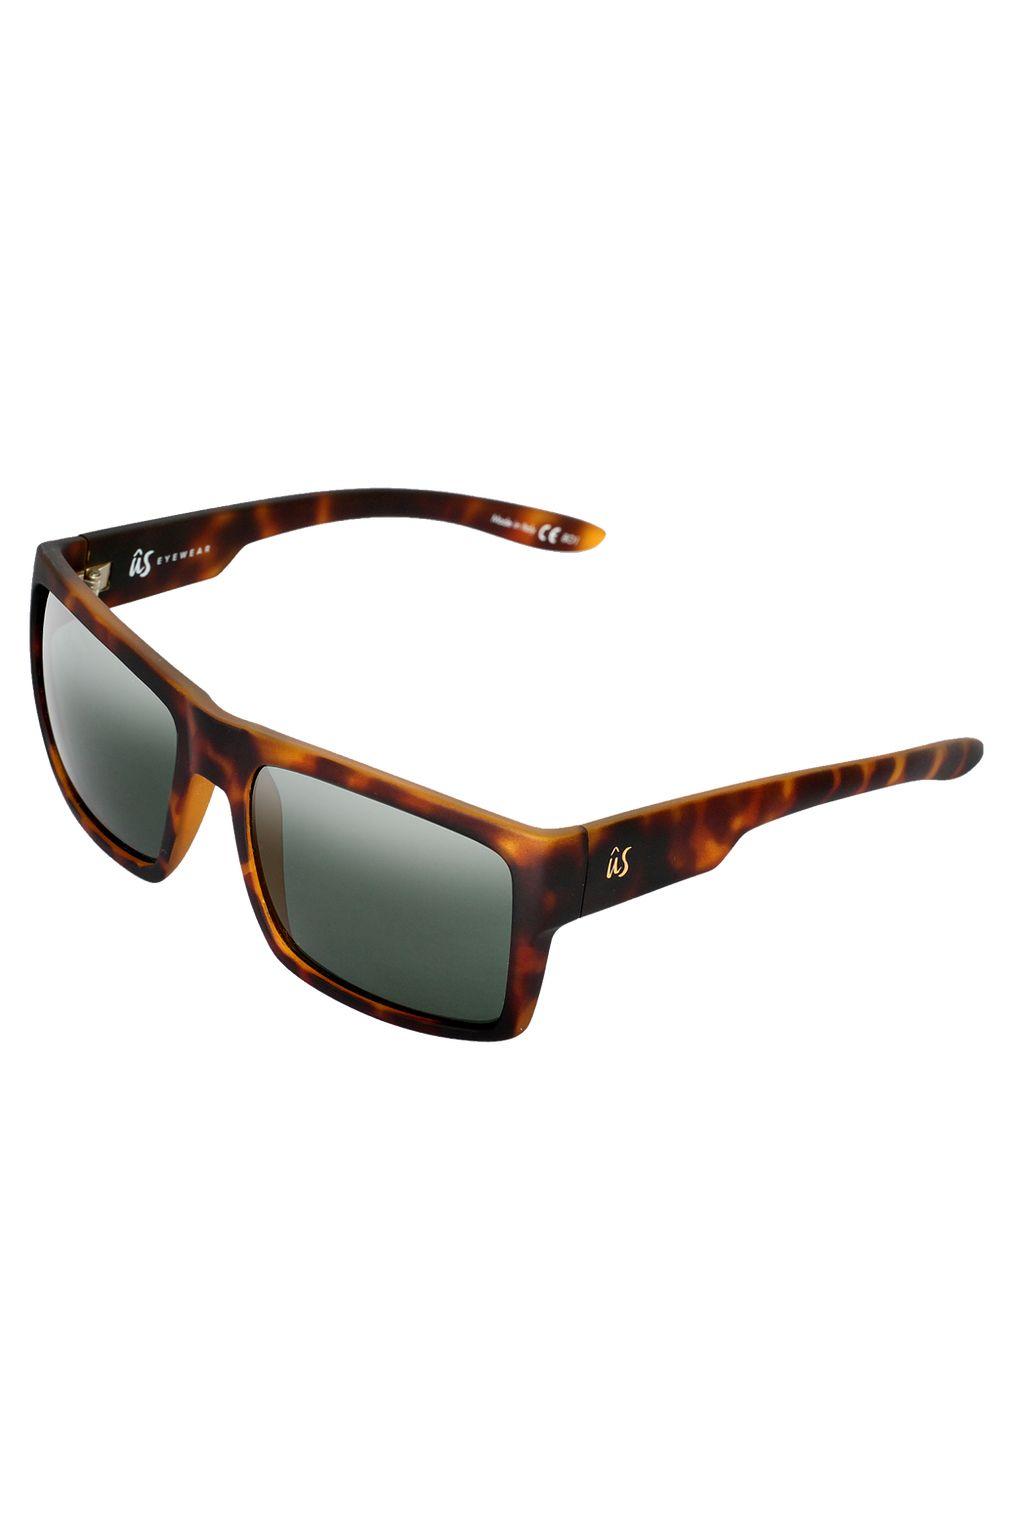 US Sunglasses HELIOS Matte Tort/Vintage Grey